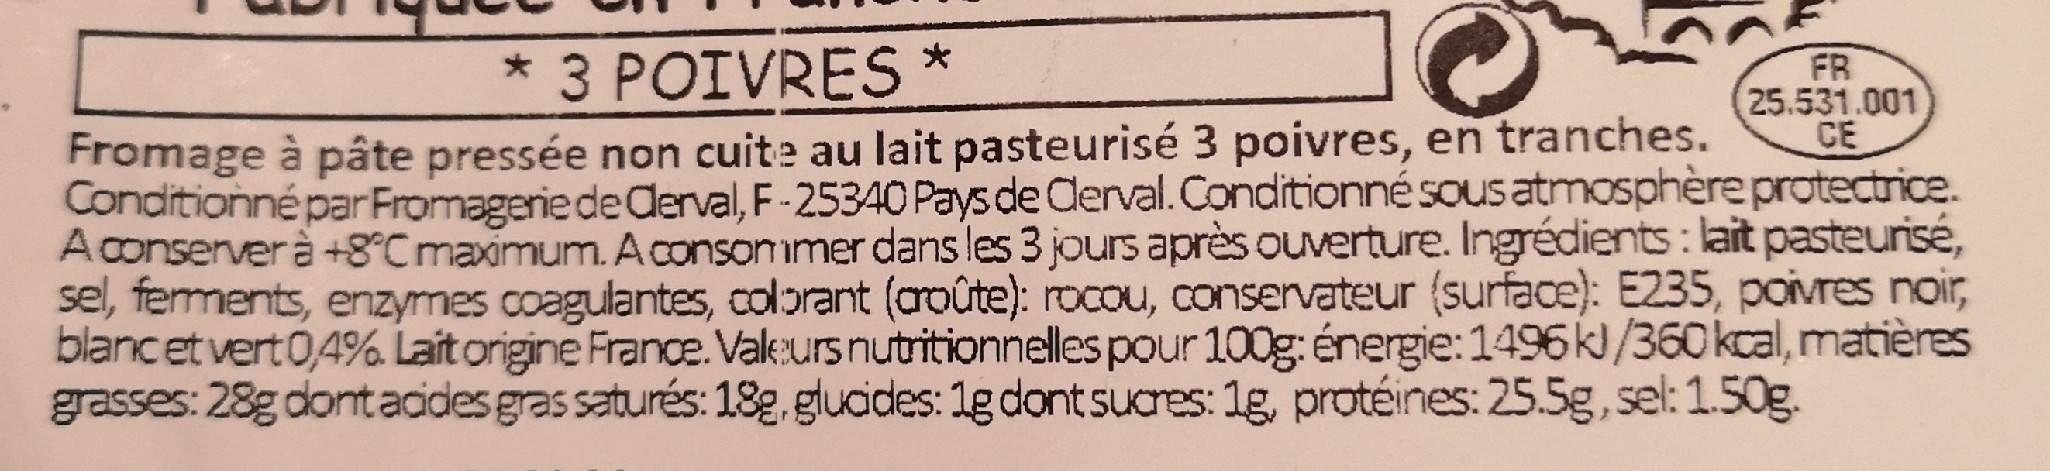 Raclette - Ingrédients - fr